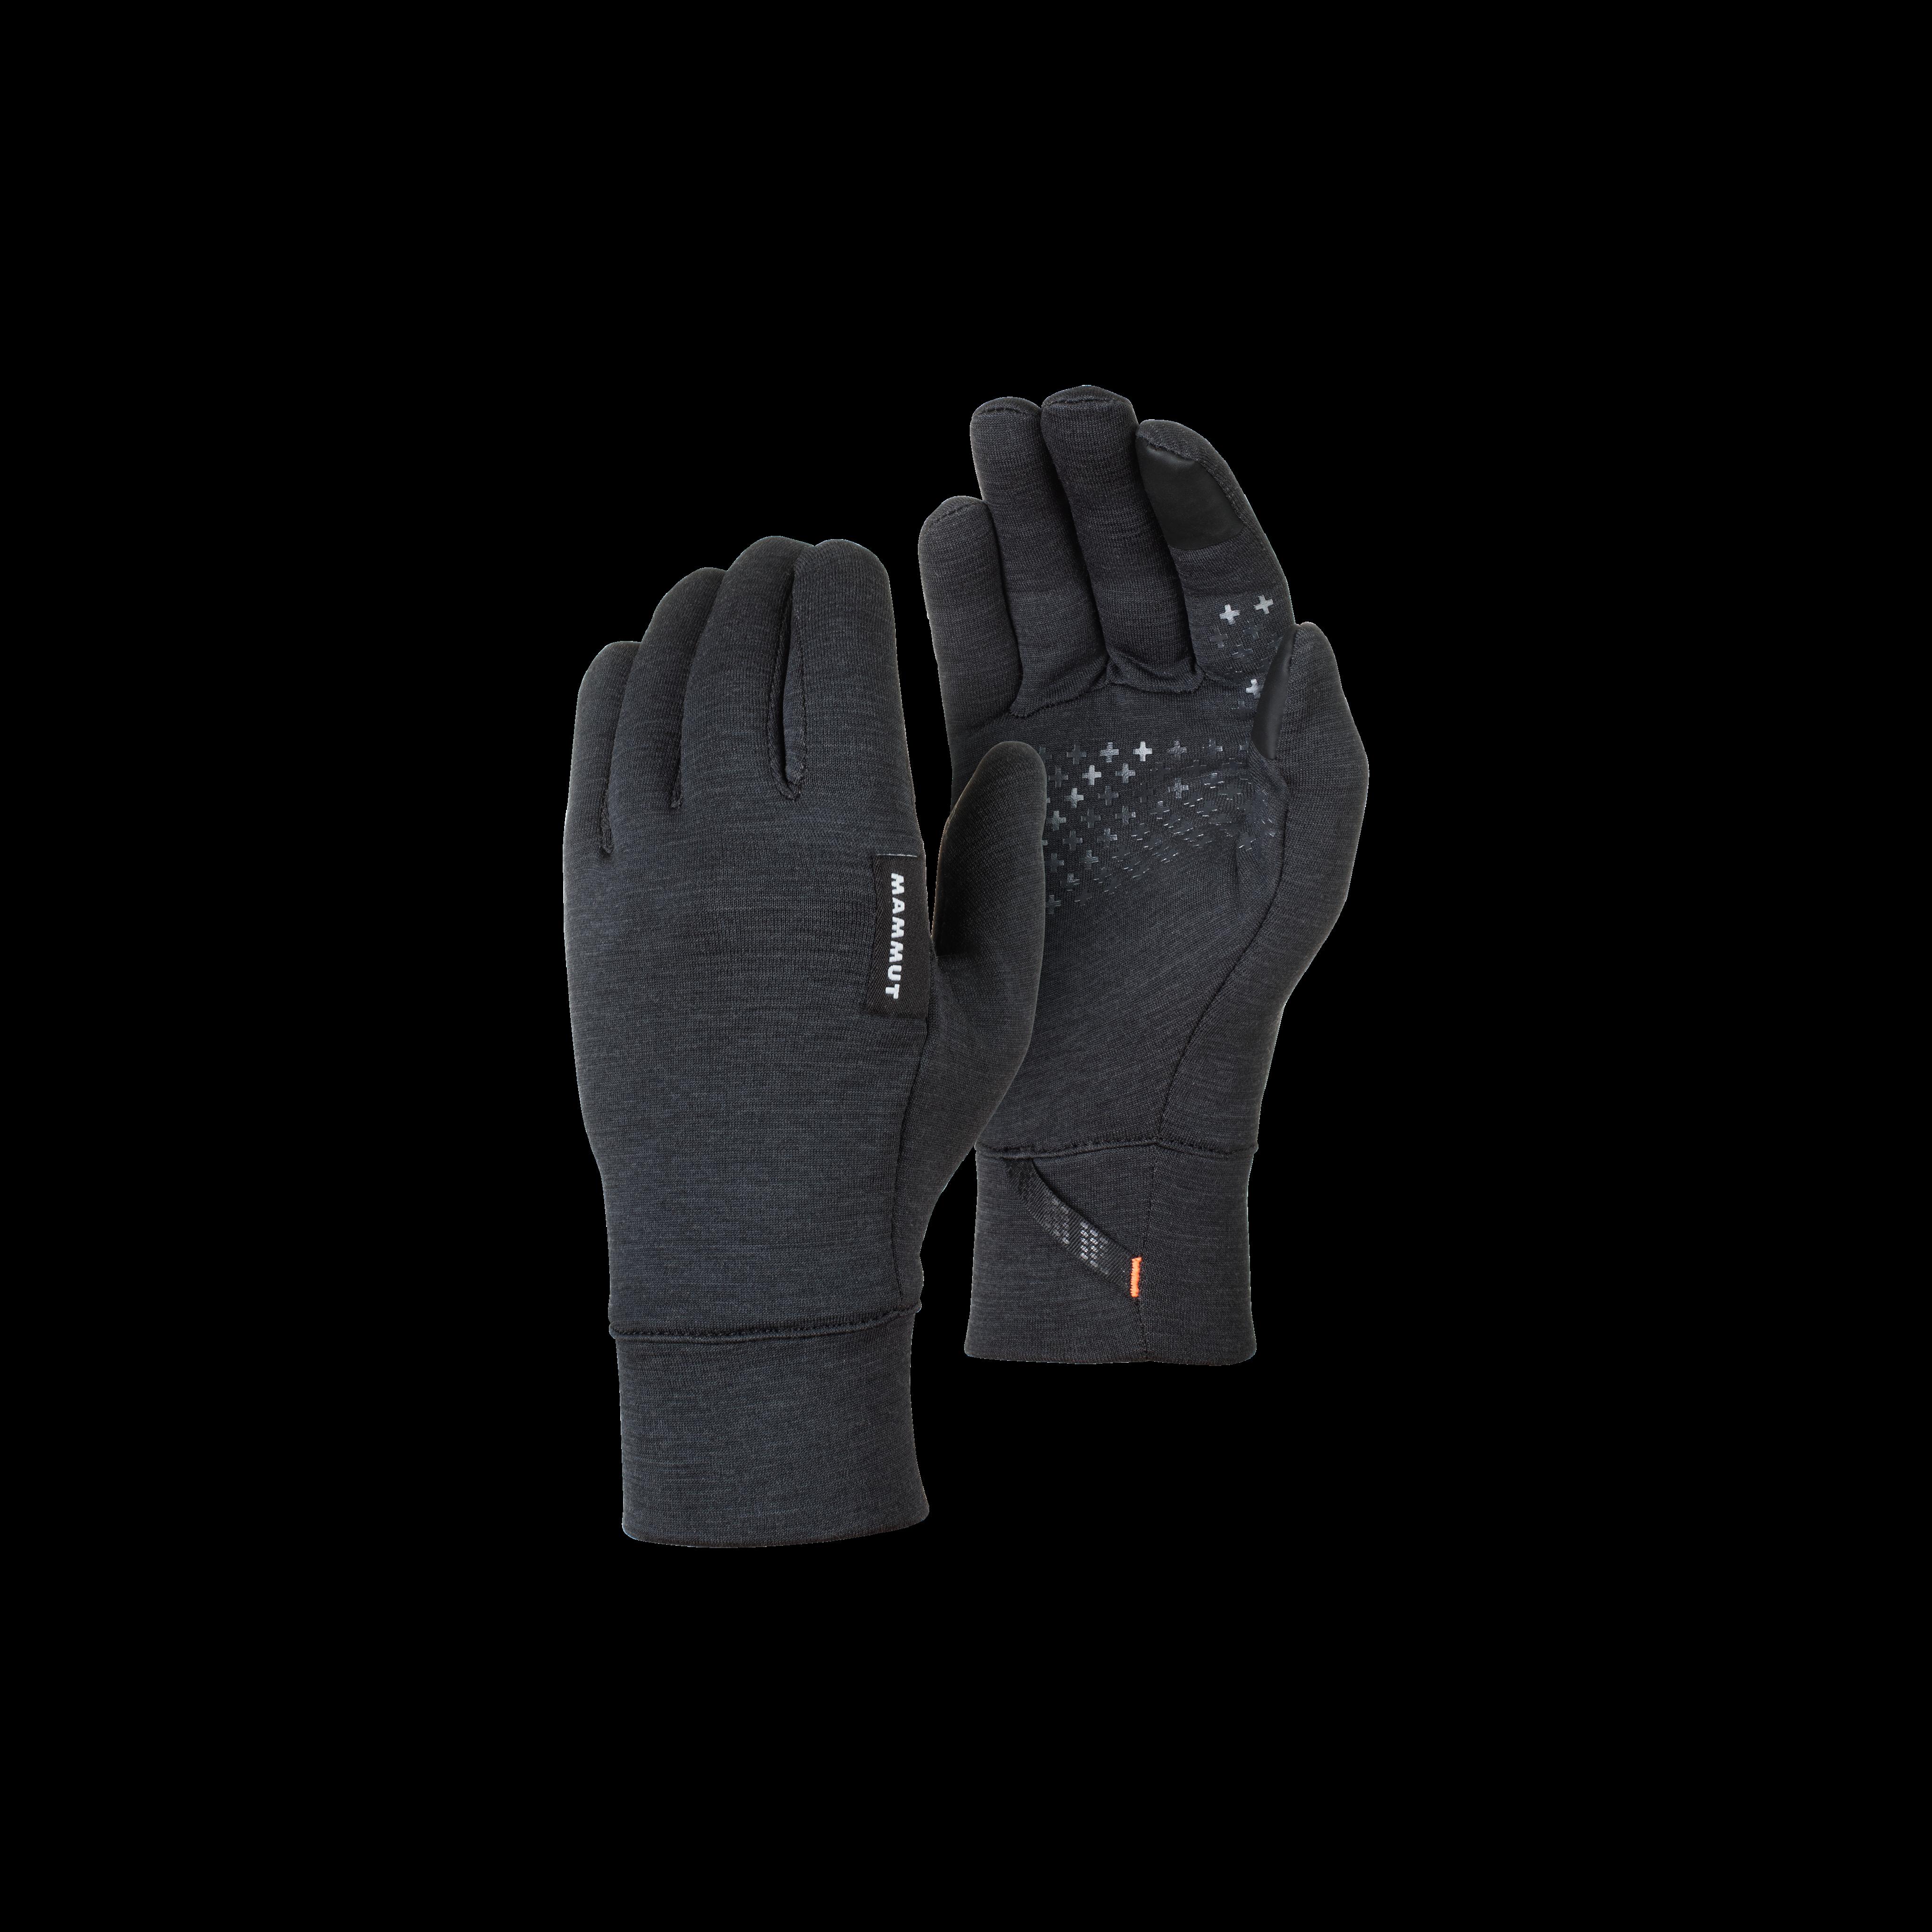 Wool Glove - 8, black mélange thumbnail